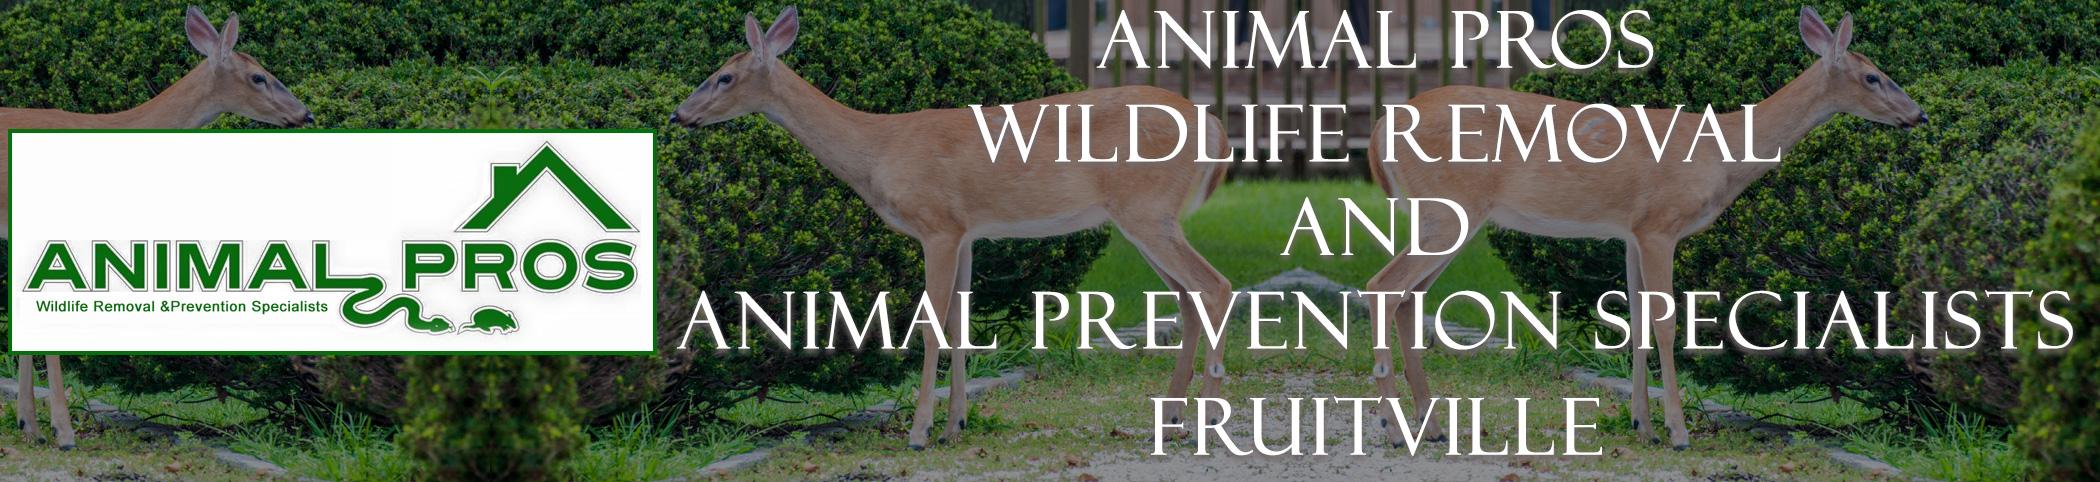 Animal Pros Fruitville Florida Bat Removal And Wildlife Removal Header Image